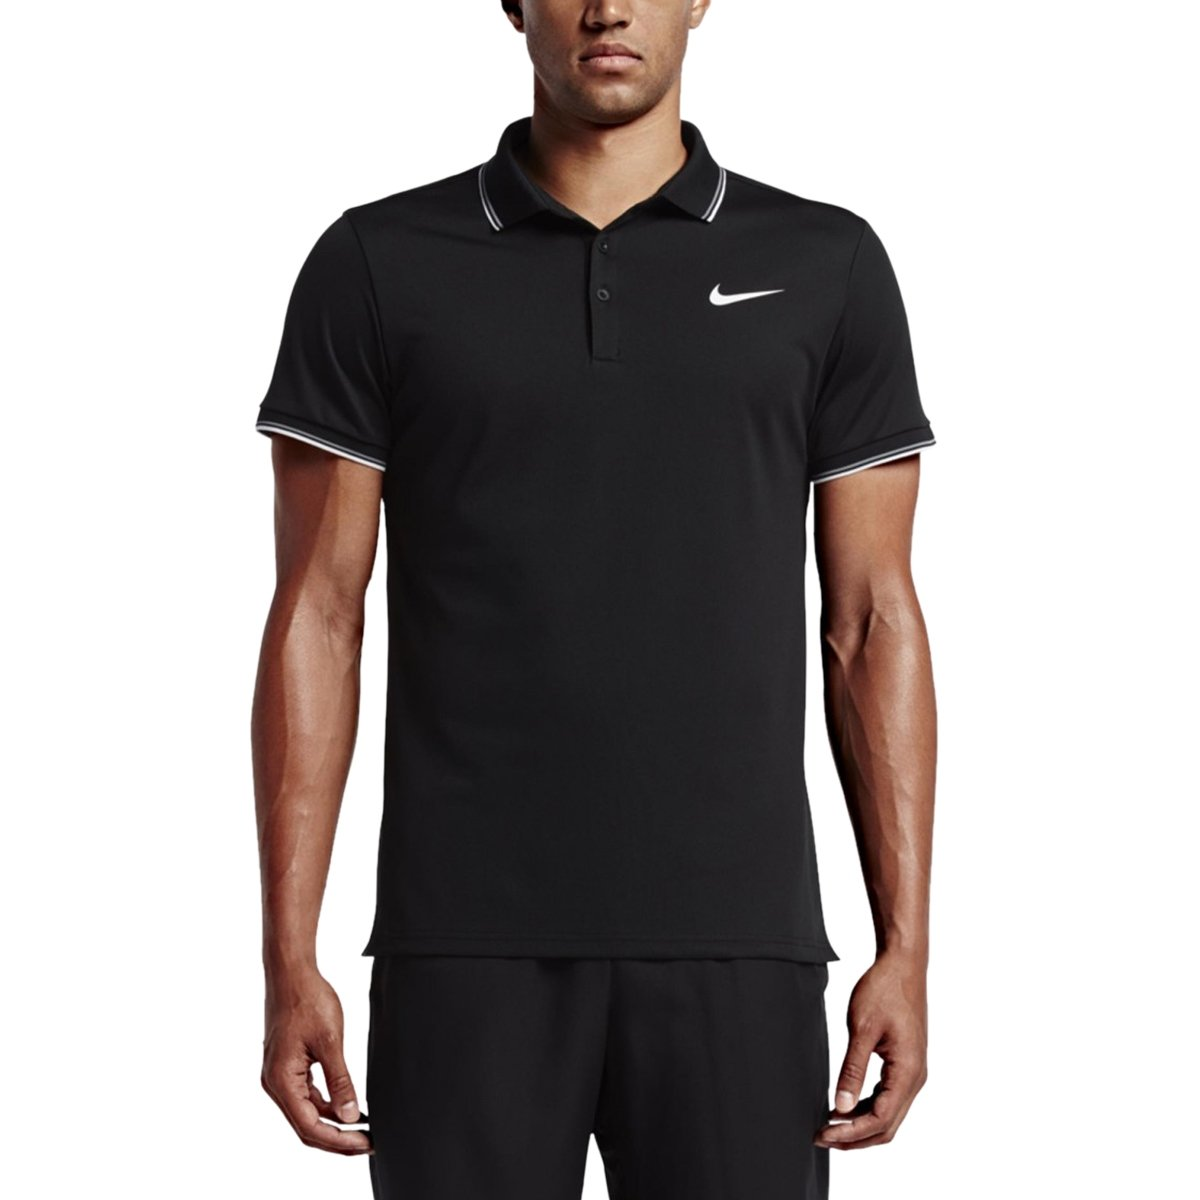 64e40bfdf1 Bizz Store - Camisa Polo Masculina Nike Court Manga Curta Preta